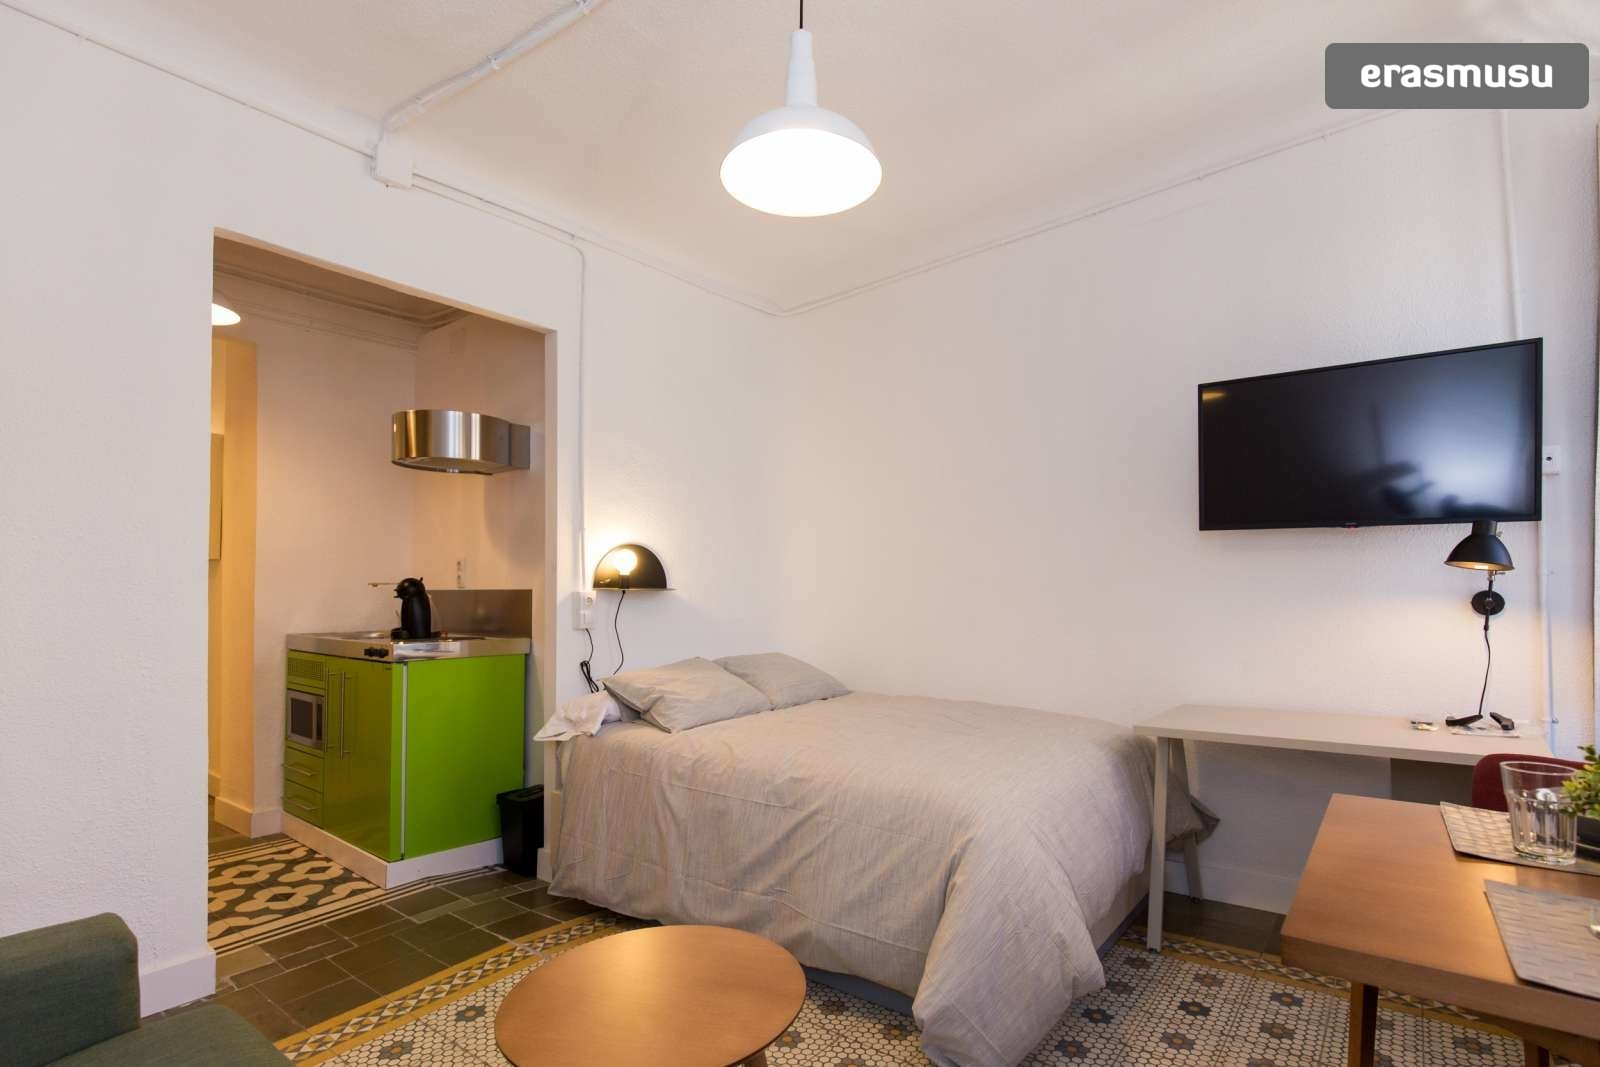 charming-studio-apartment-rent-city-centre-fd2c2510645c07475a5a1